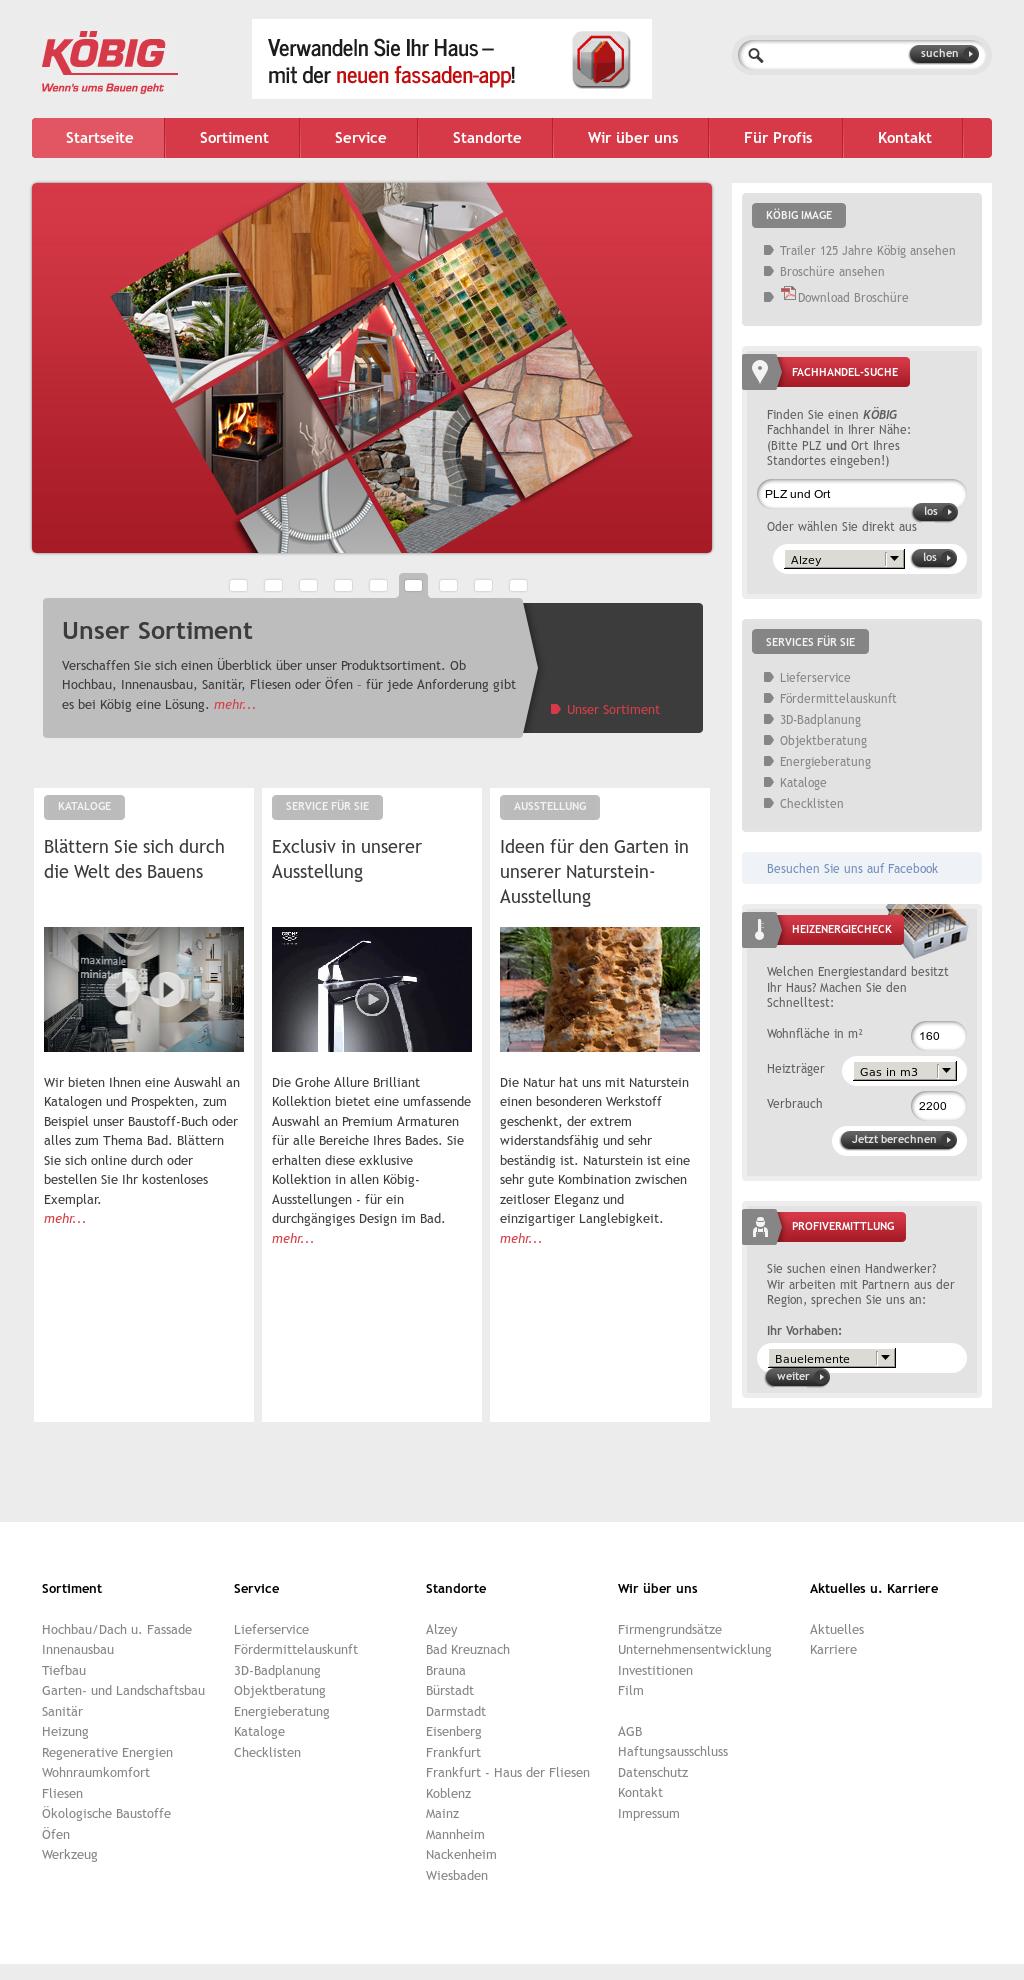 Haus Der Fliesen Frankfurt j n koebig competitors revenue and employees owler company profile